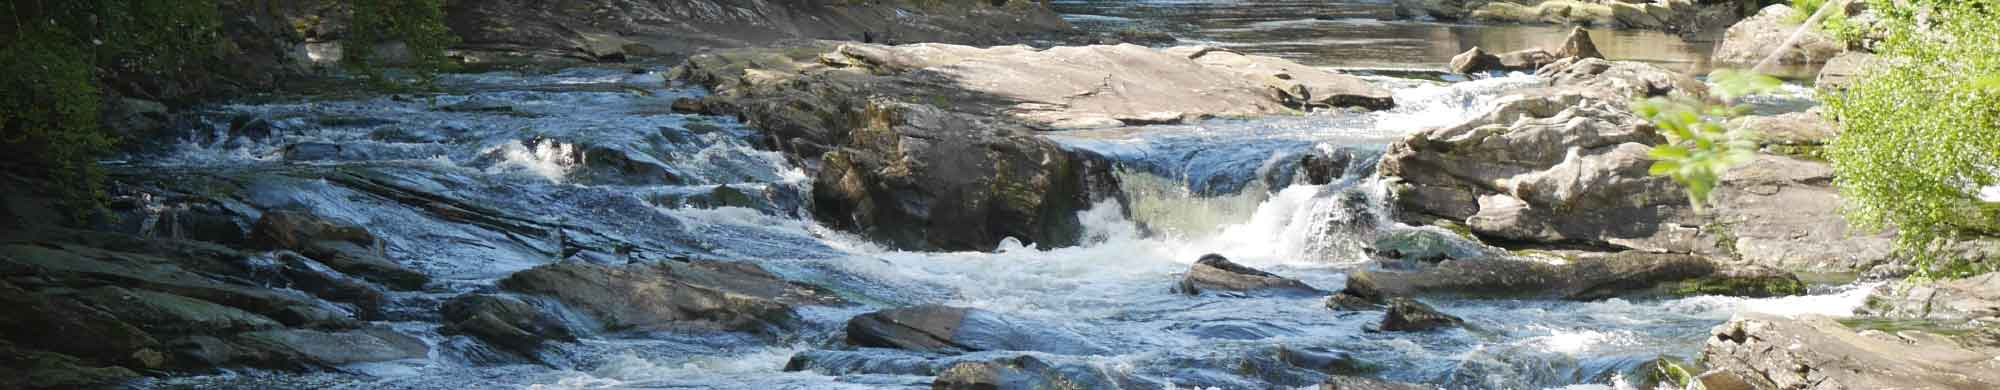 banner-green-meetings-river